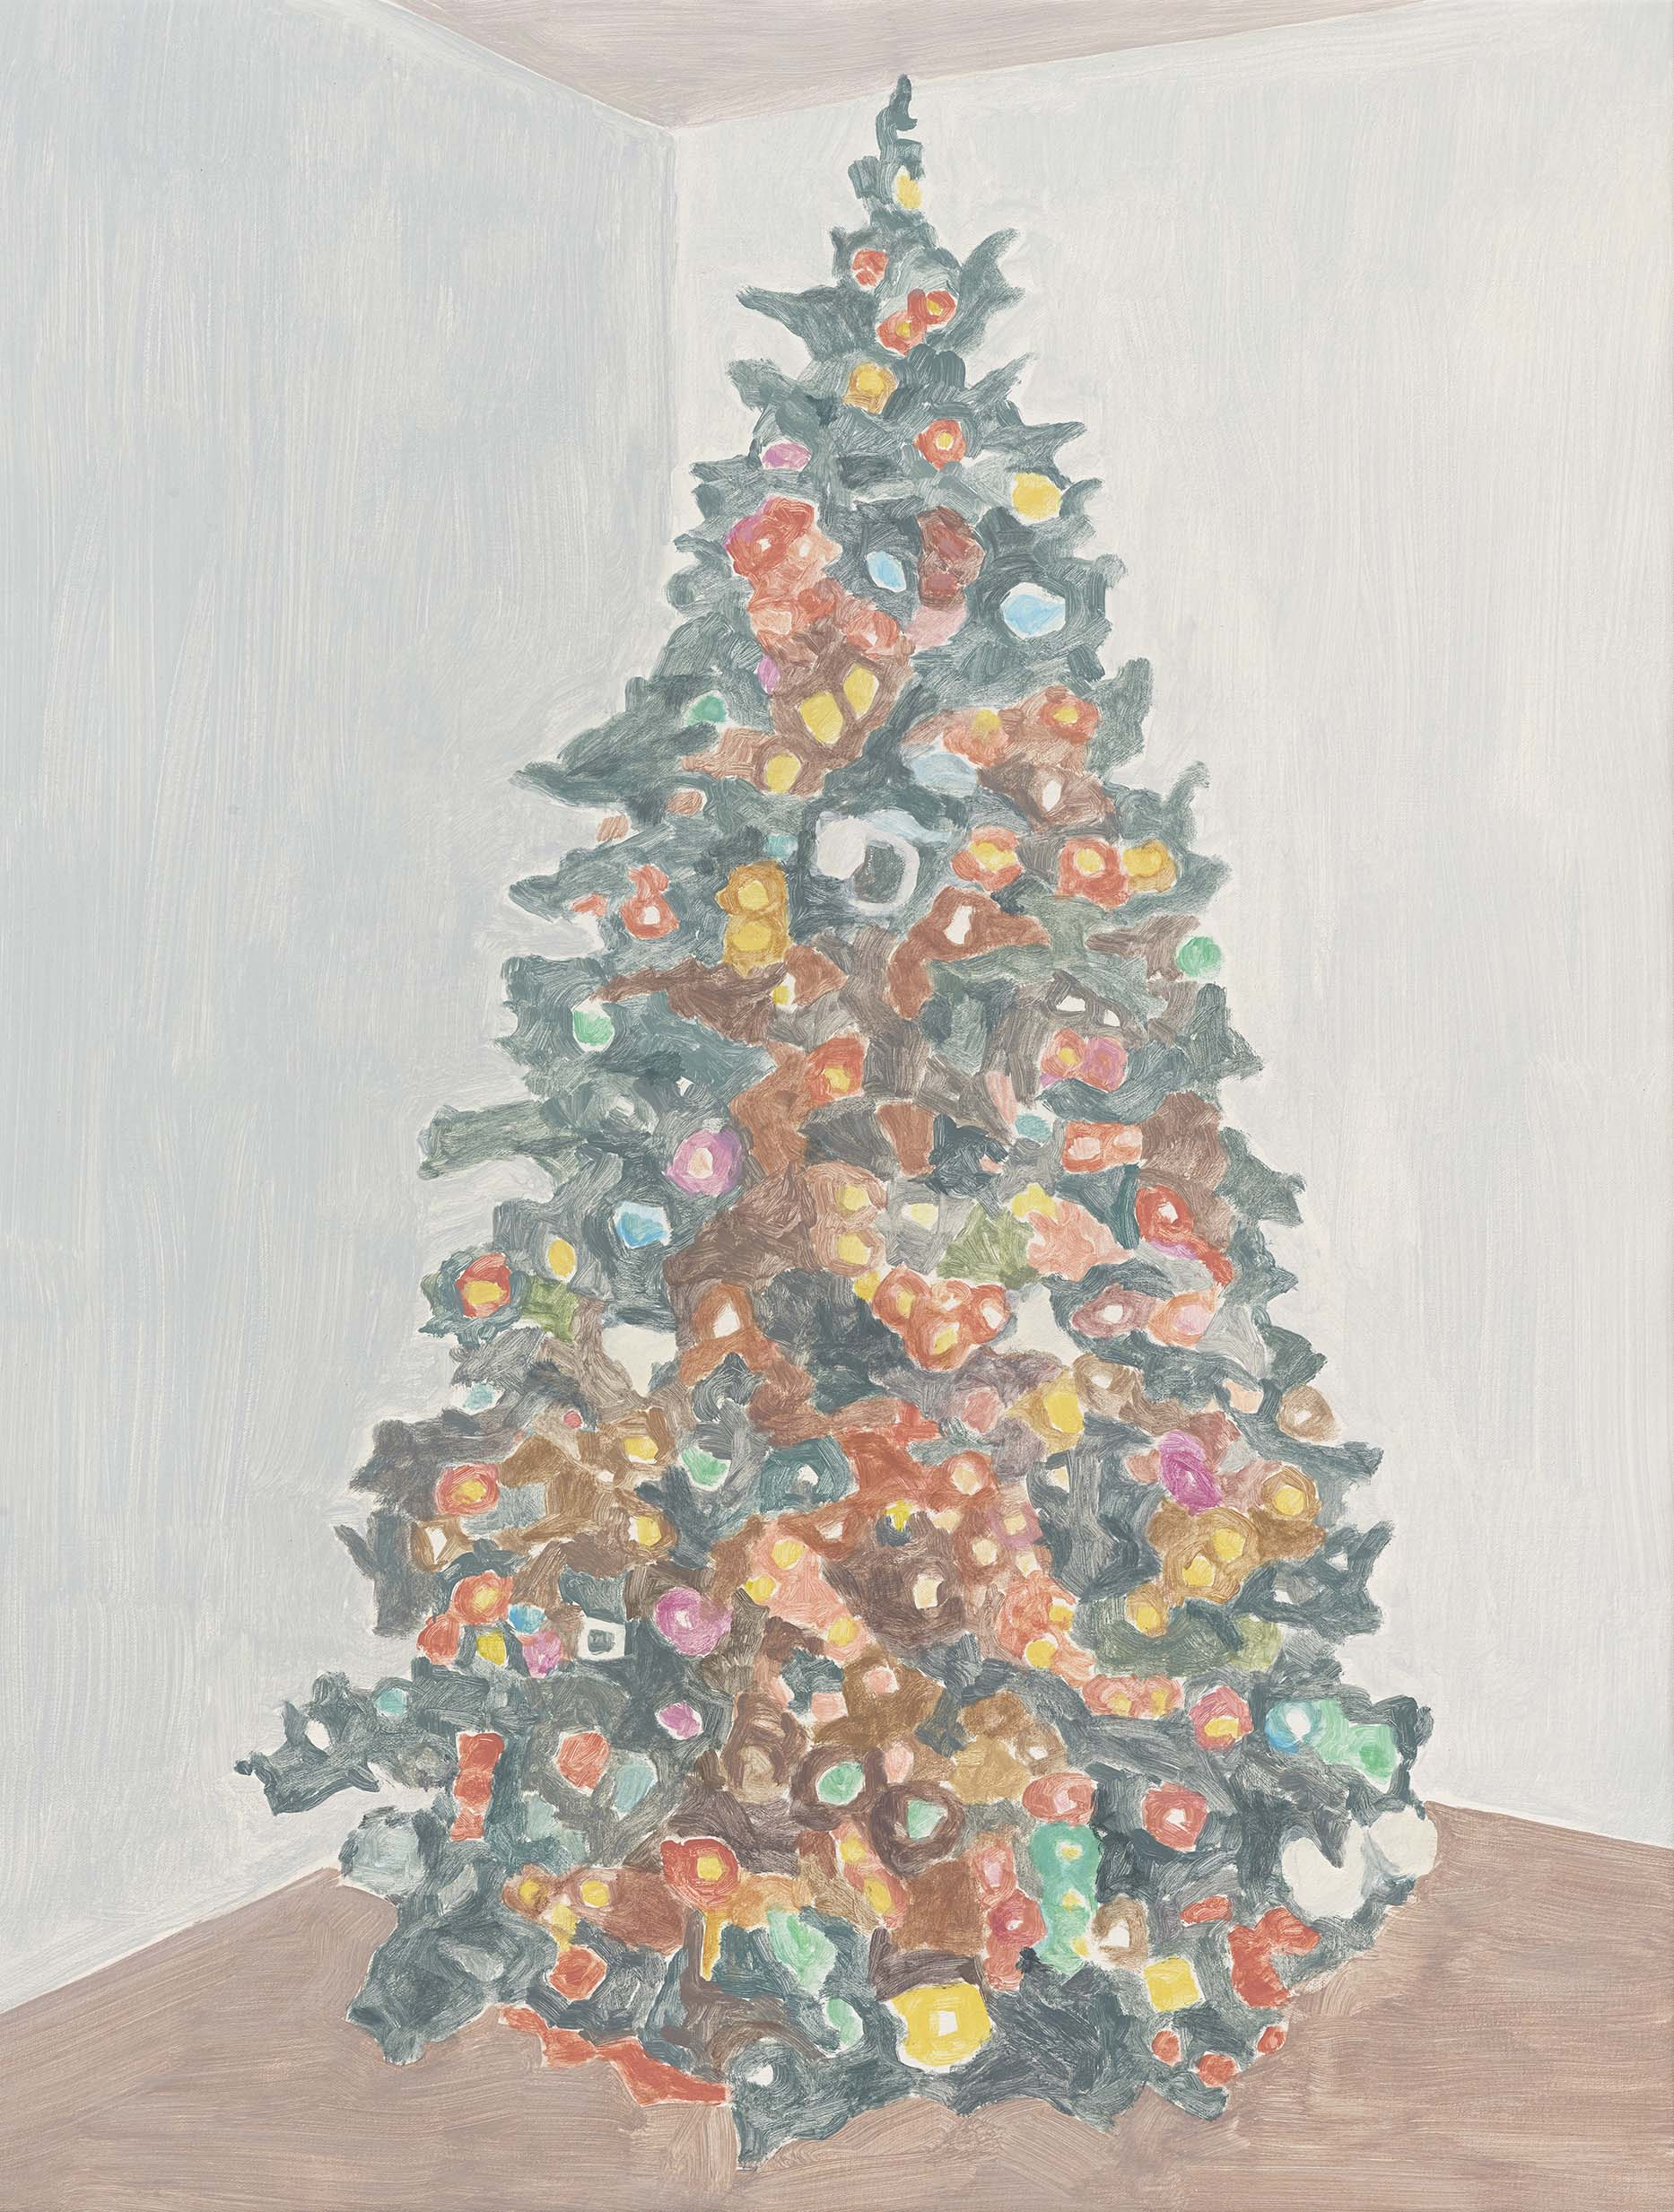 Xmas Tree (lights), acrylic on canvas, 32 x 24.25 inches, 2015.